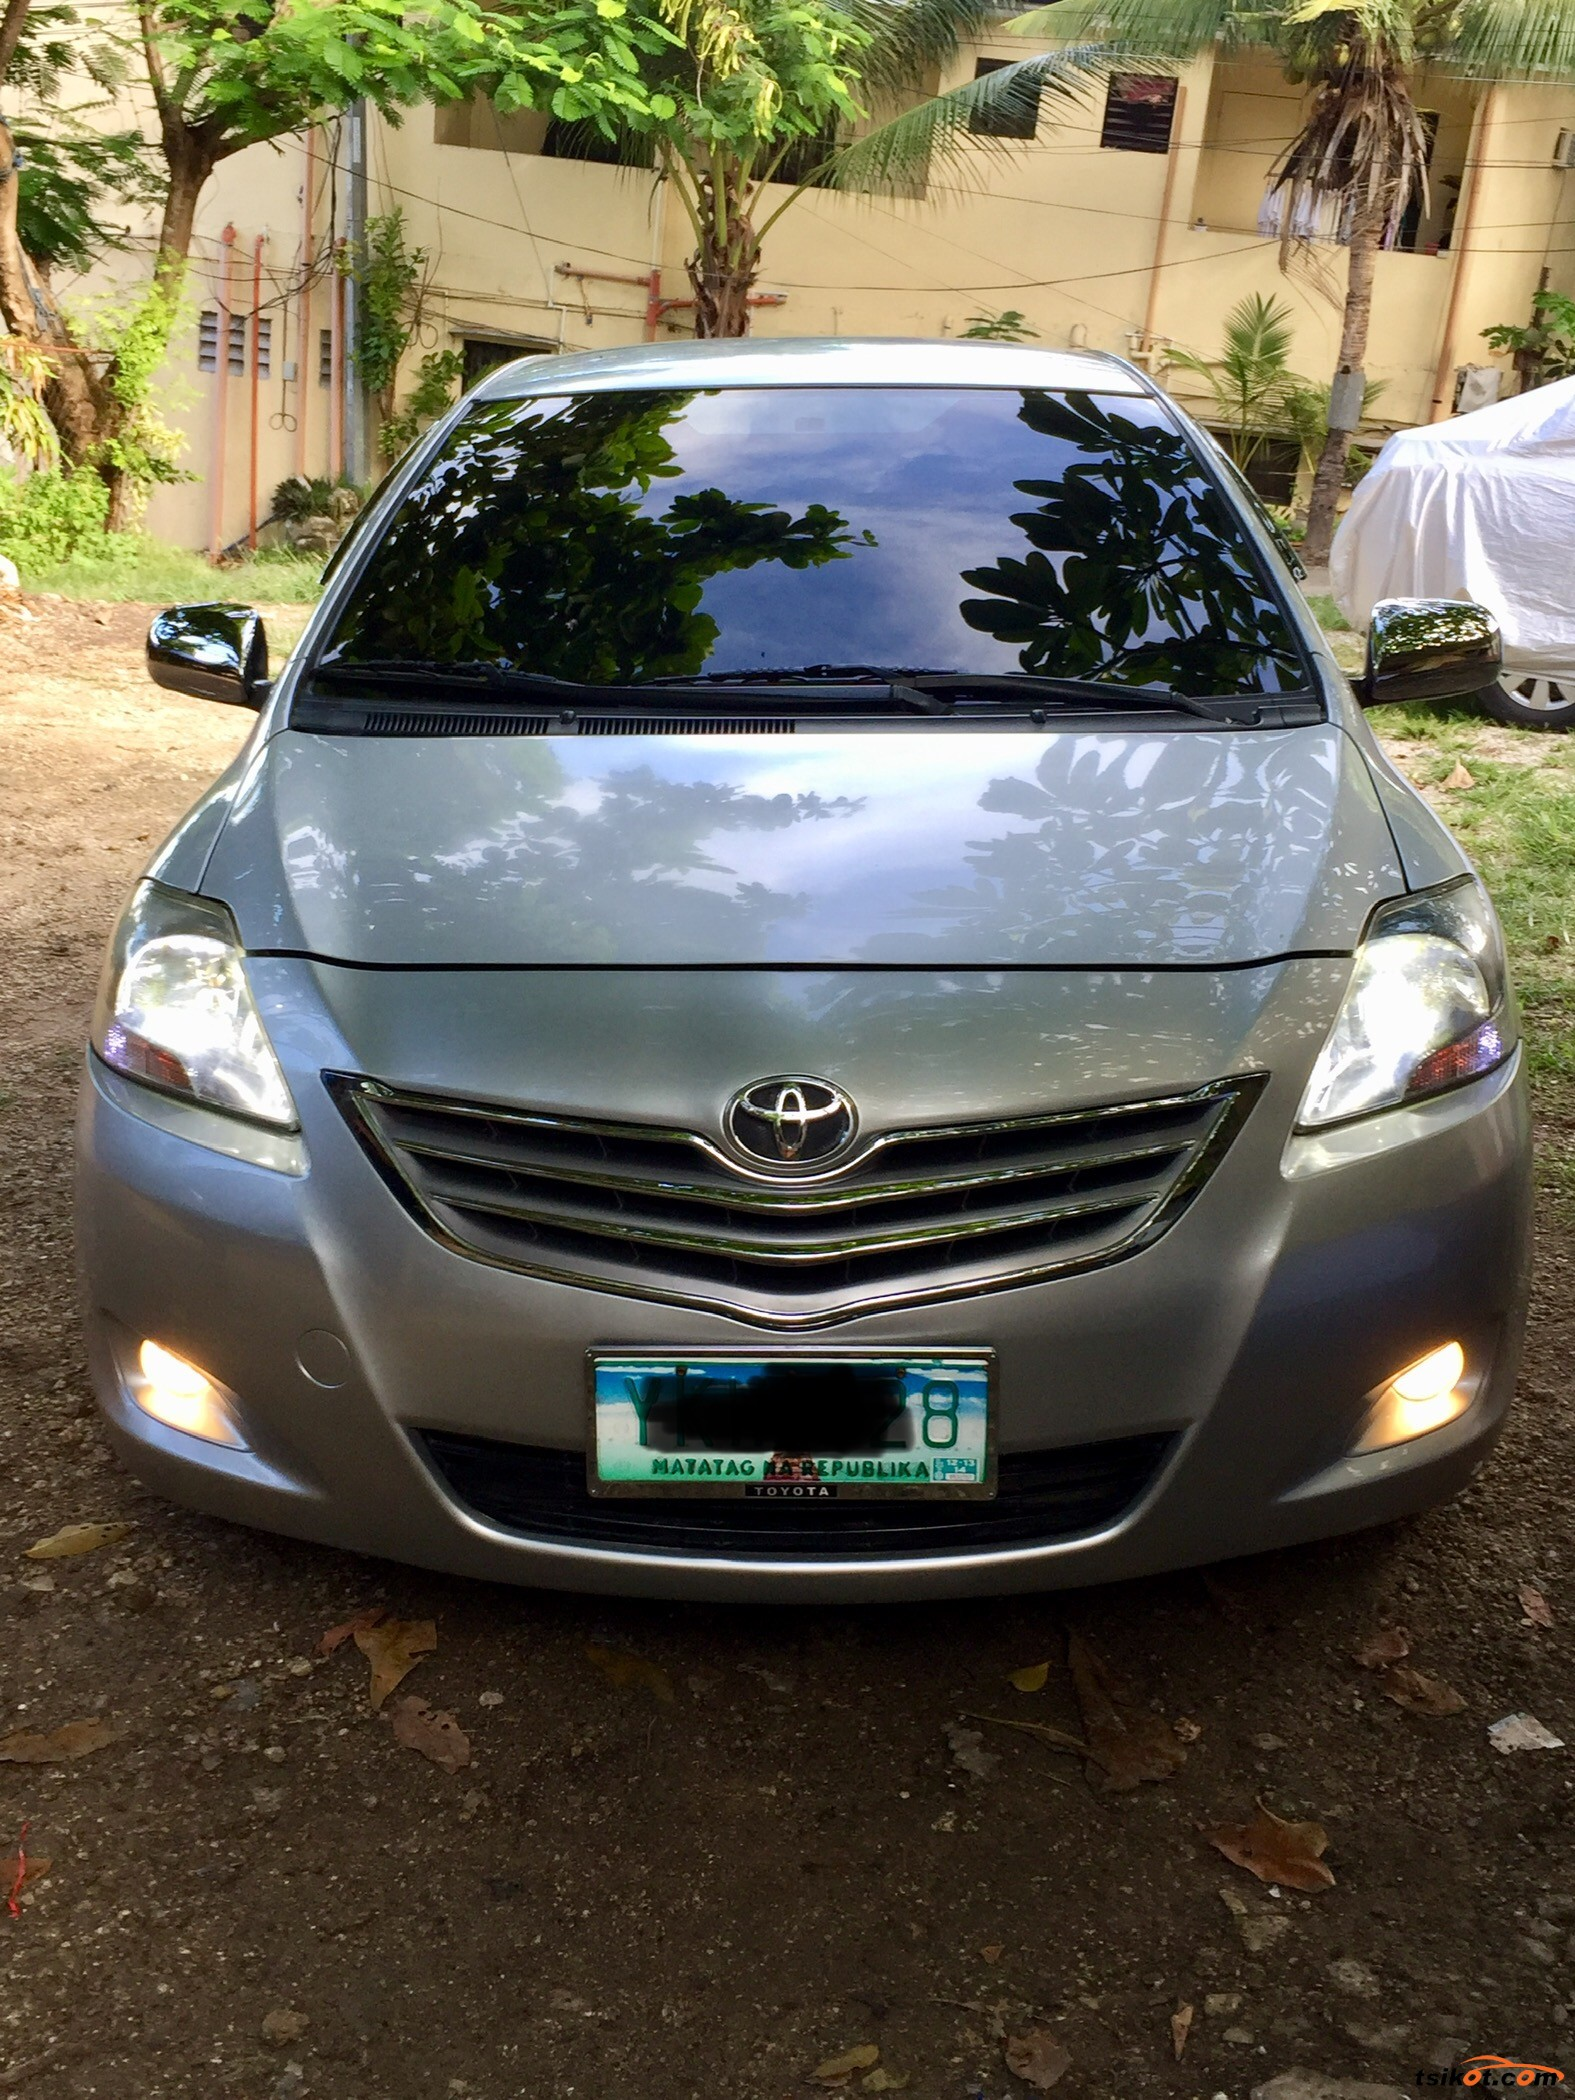 Toyota Vios 2012 - 6